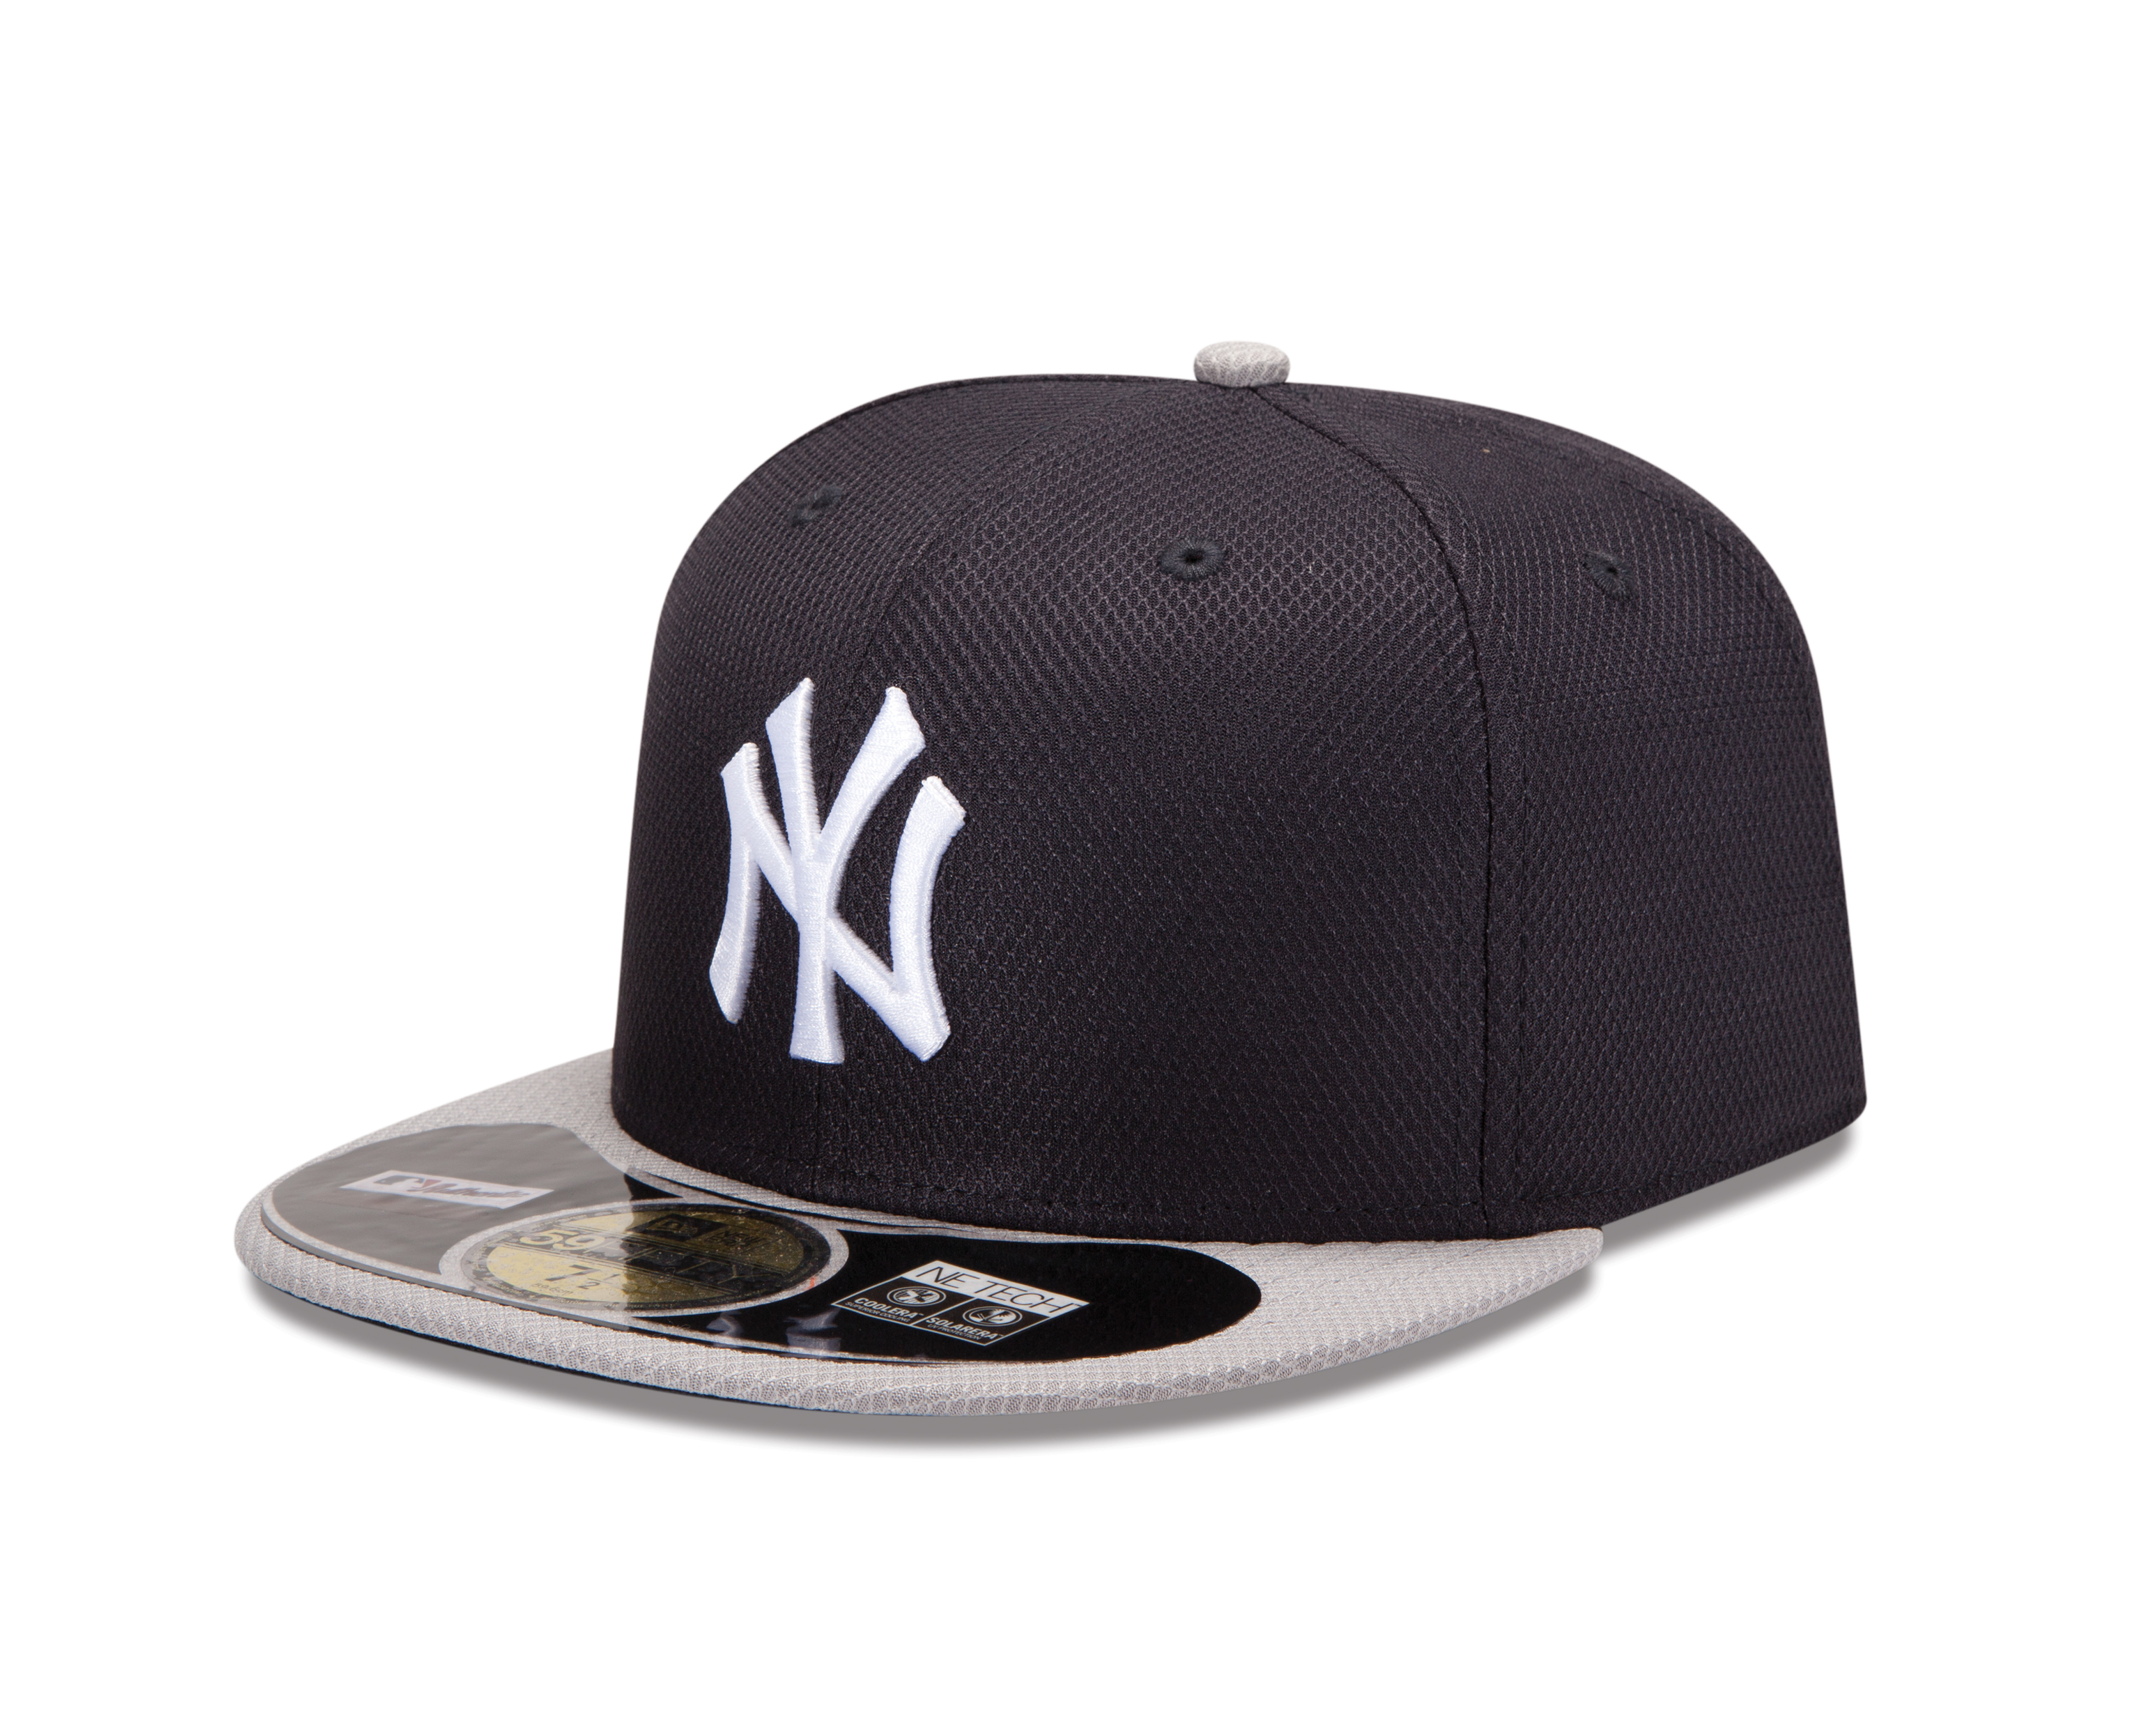 Yankies baseball cap clipart clip art transparent download Free Yankees Cap Cliparts, Download Free Clip Art, Free Clip ... clip art transparent download